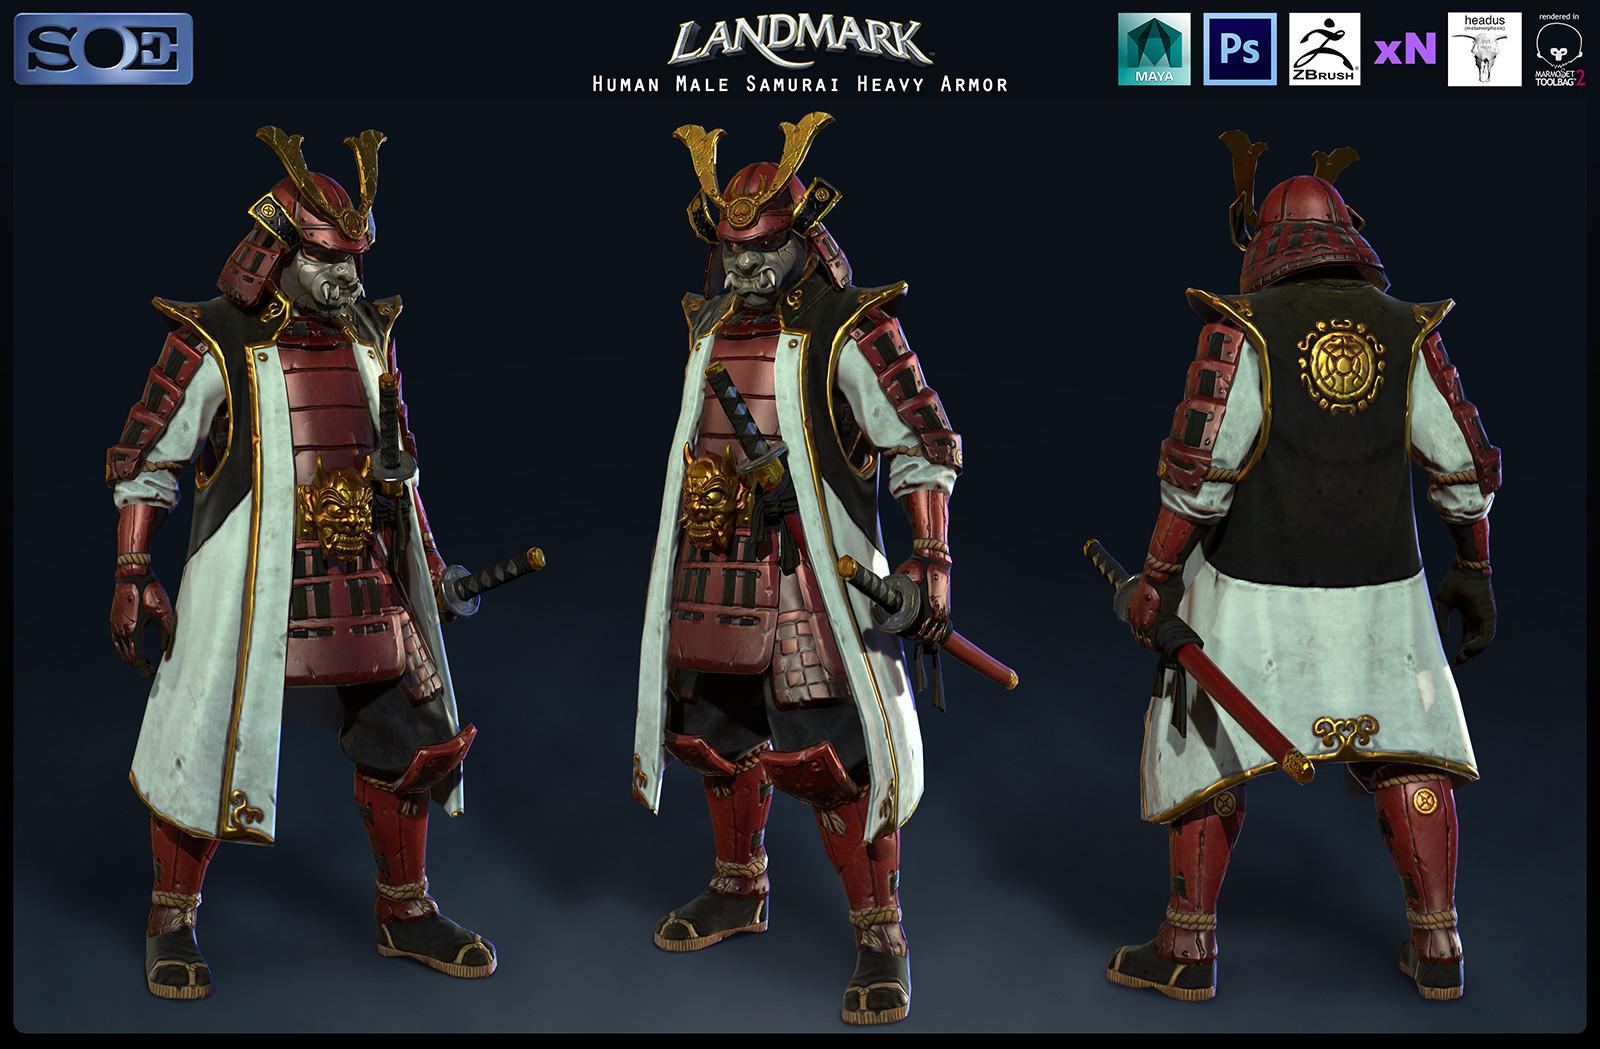 Human Male Samurai Heavy Armor